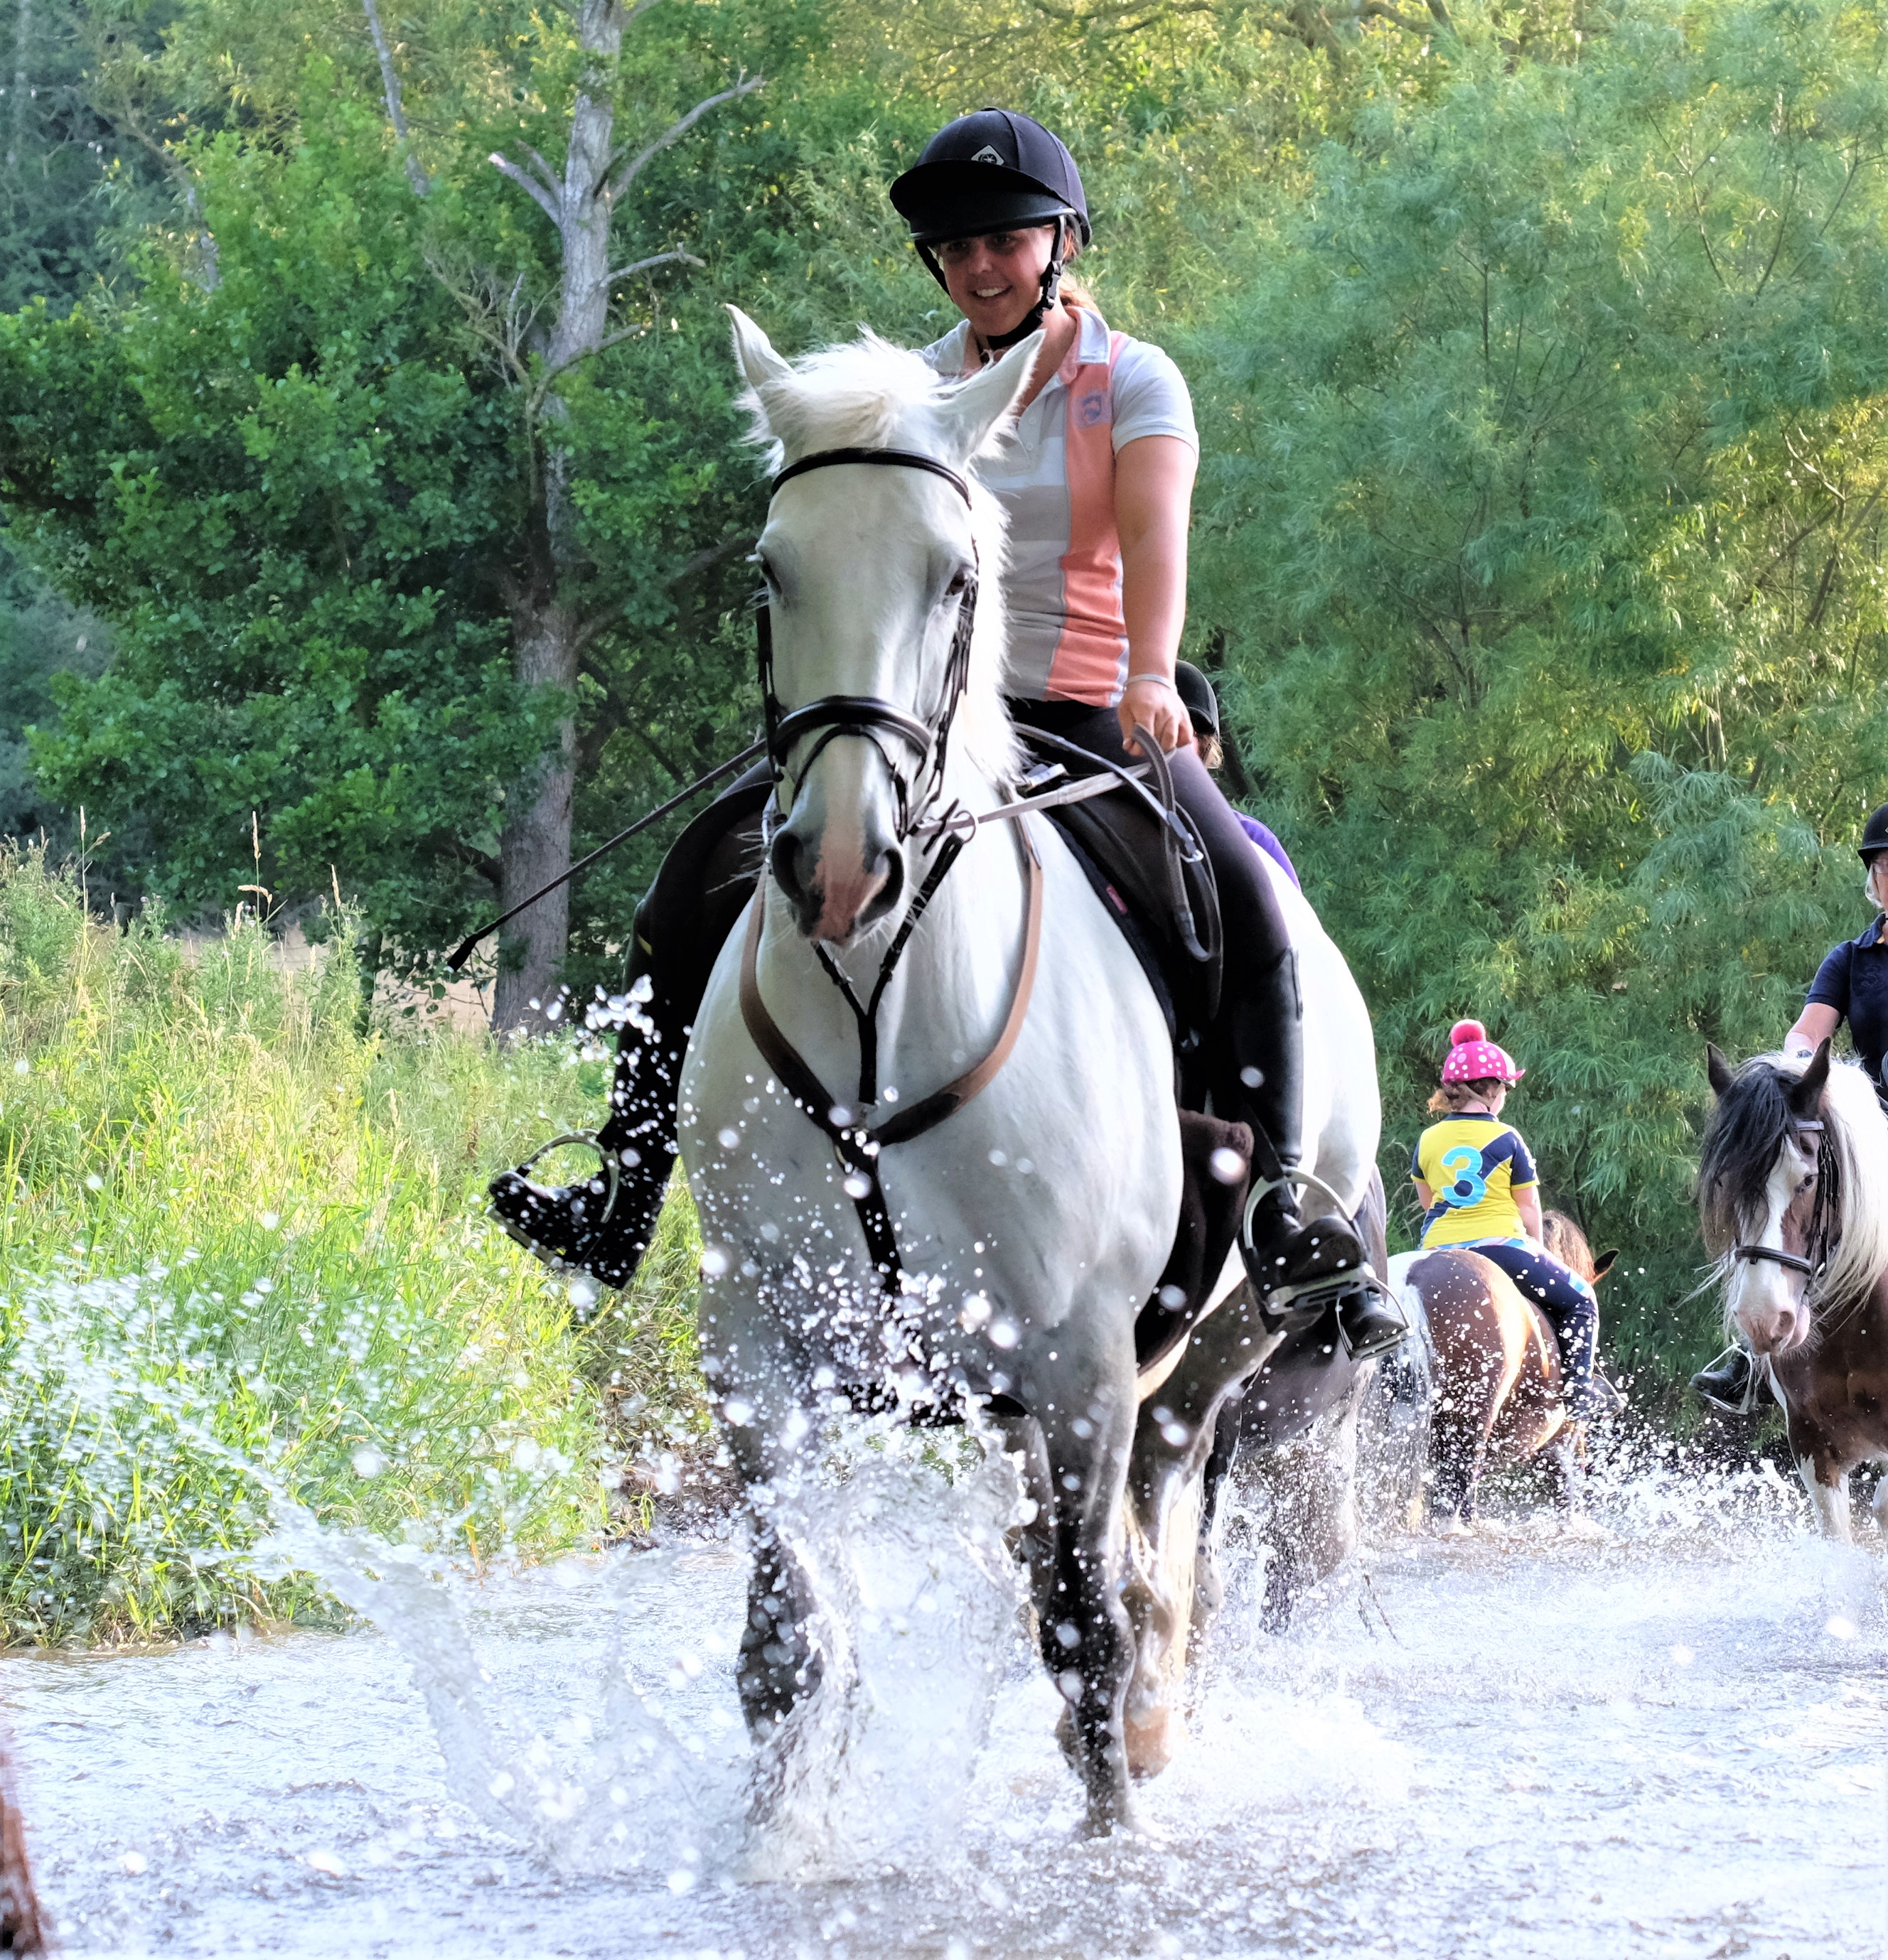 Llannerch River Ride 1 Aug 2019 (28)